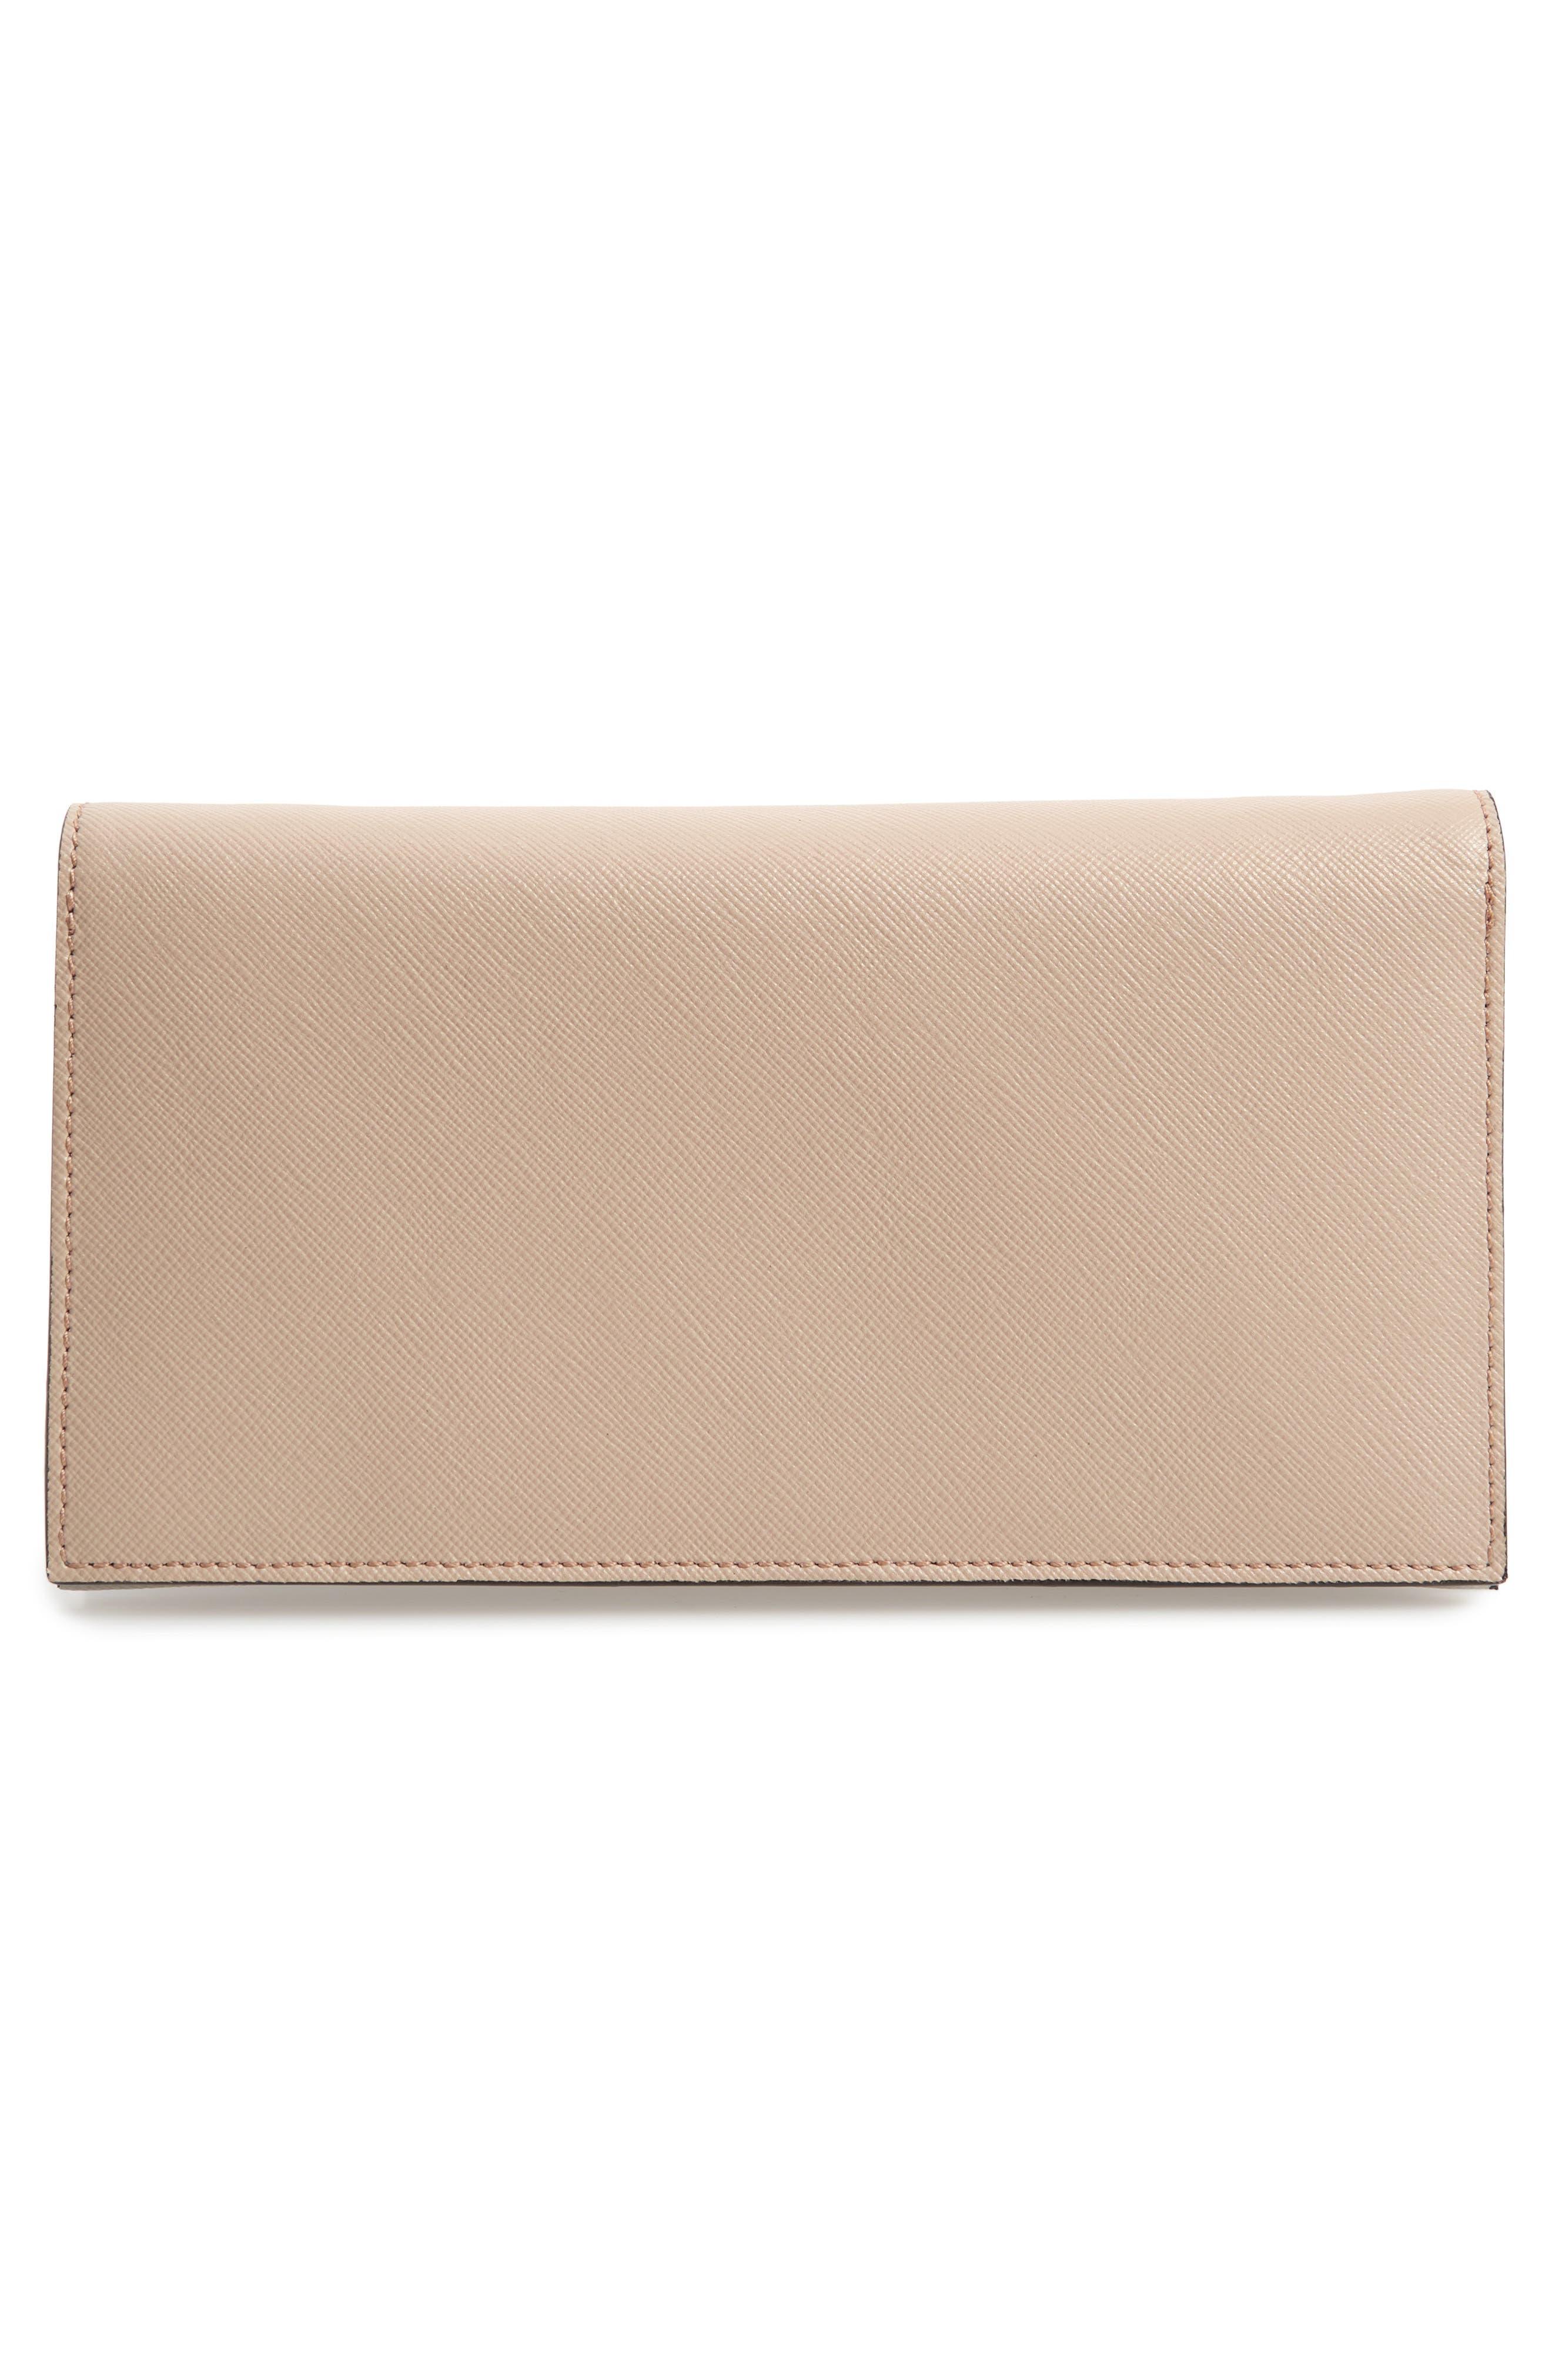 Trunk Leather Crossbody Wallet,                             Alternate thumbnail 4, color,                             LIGHT CAMEL/ VANILLA/ PELICAN